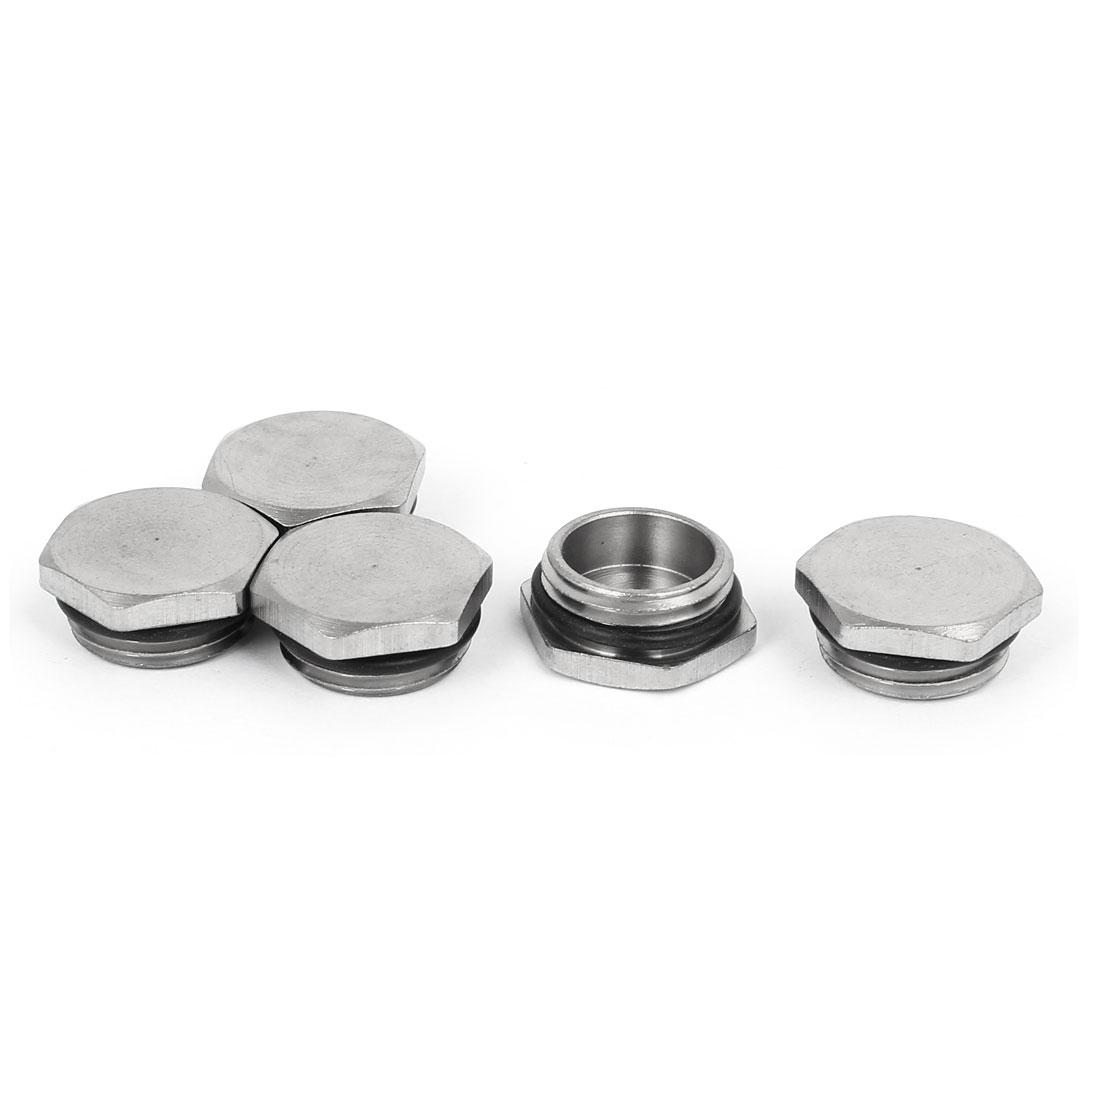 M18x1.5 Nickel Plated Waterproof Hex Head Pipe Silver Tone 5pcs